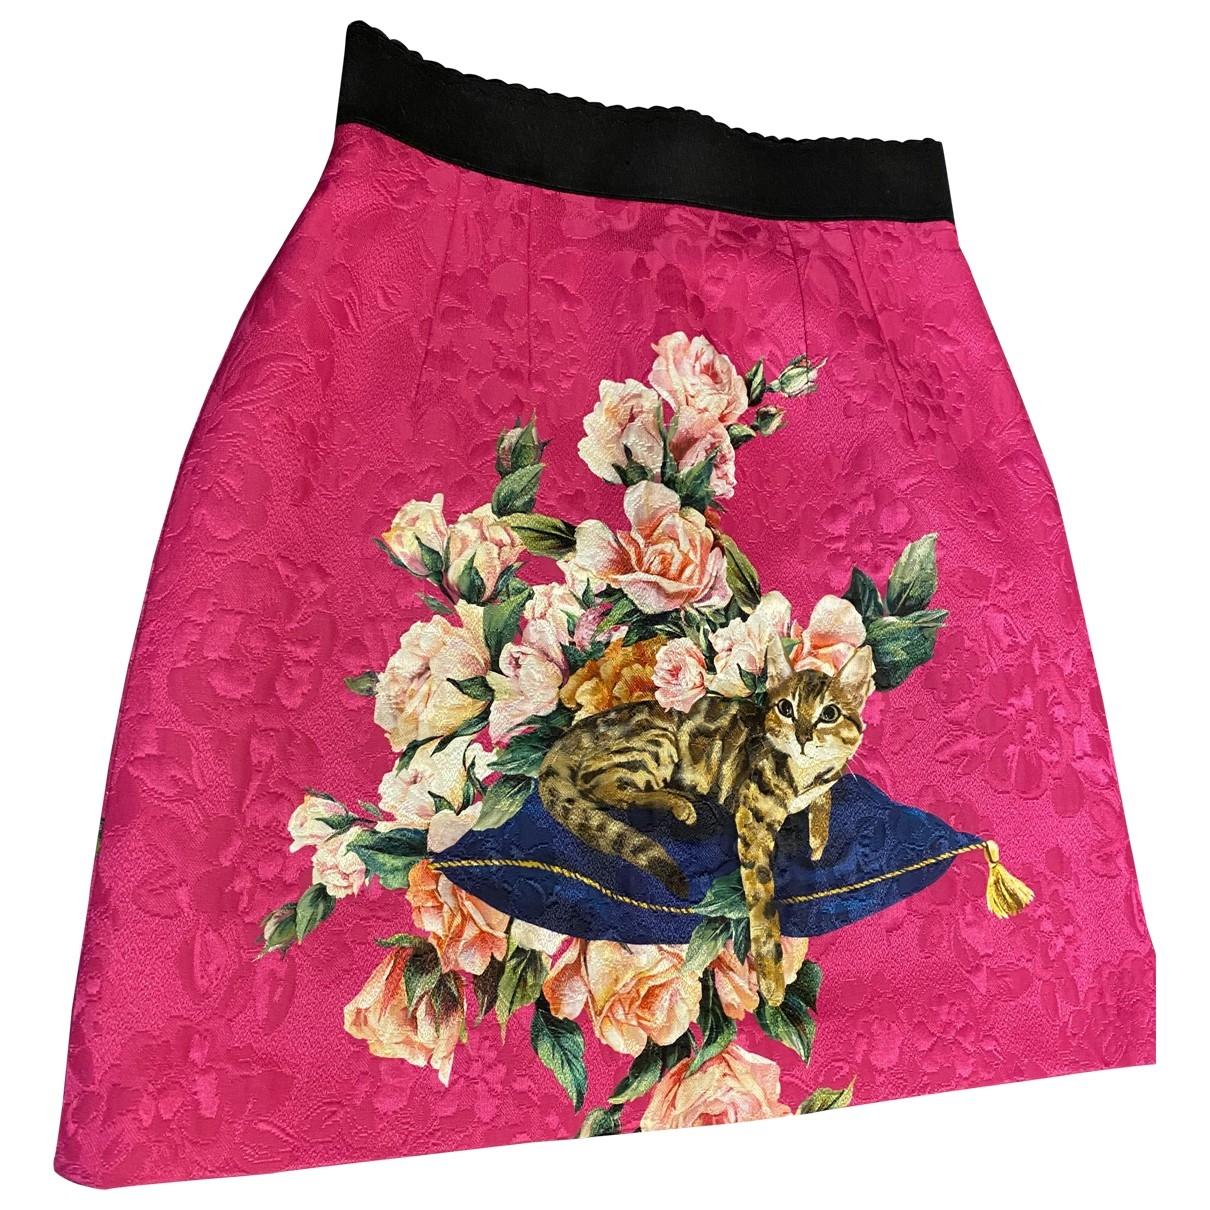 Dolce & Gabbana - Jupe   pour femme en coton - elasthane - rose